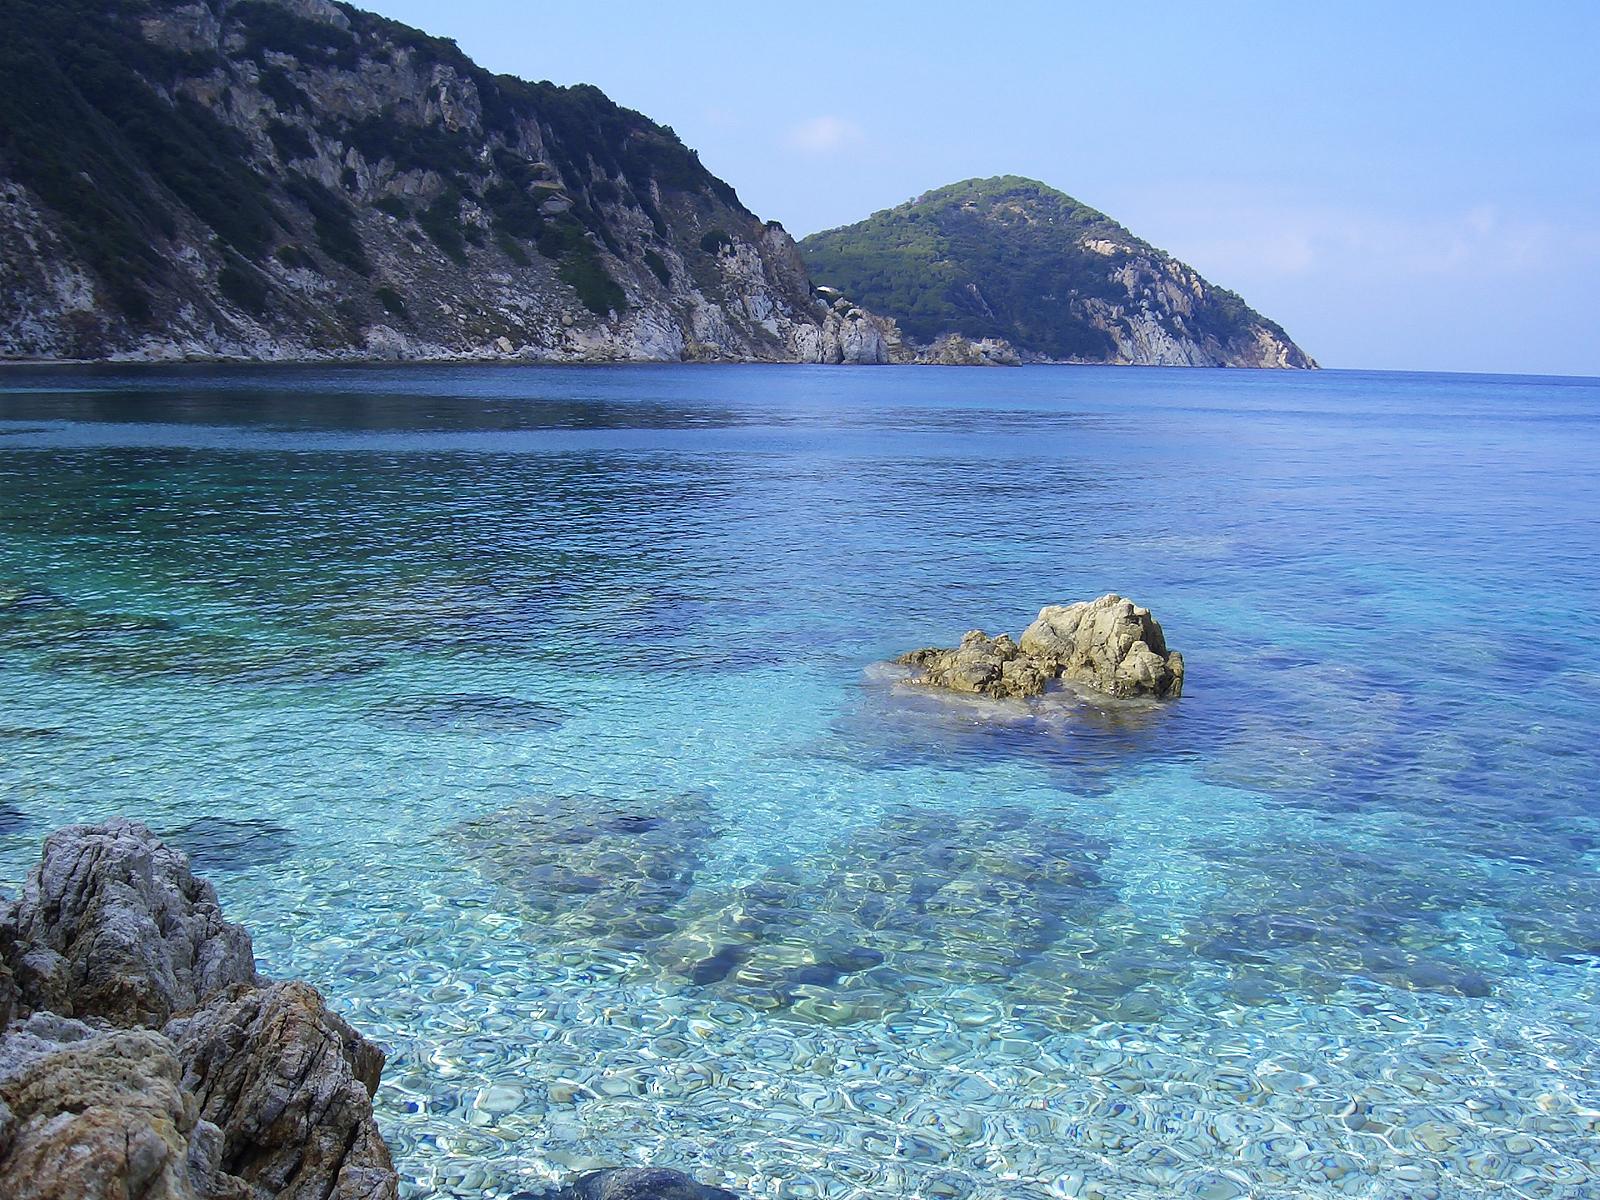 Meteo 10 agosto stelle cadenti Isola d'Elba